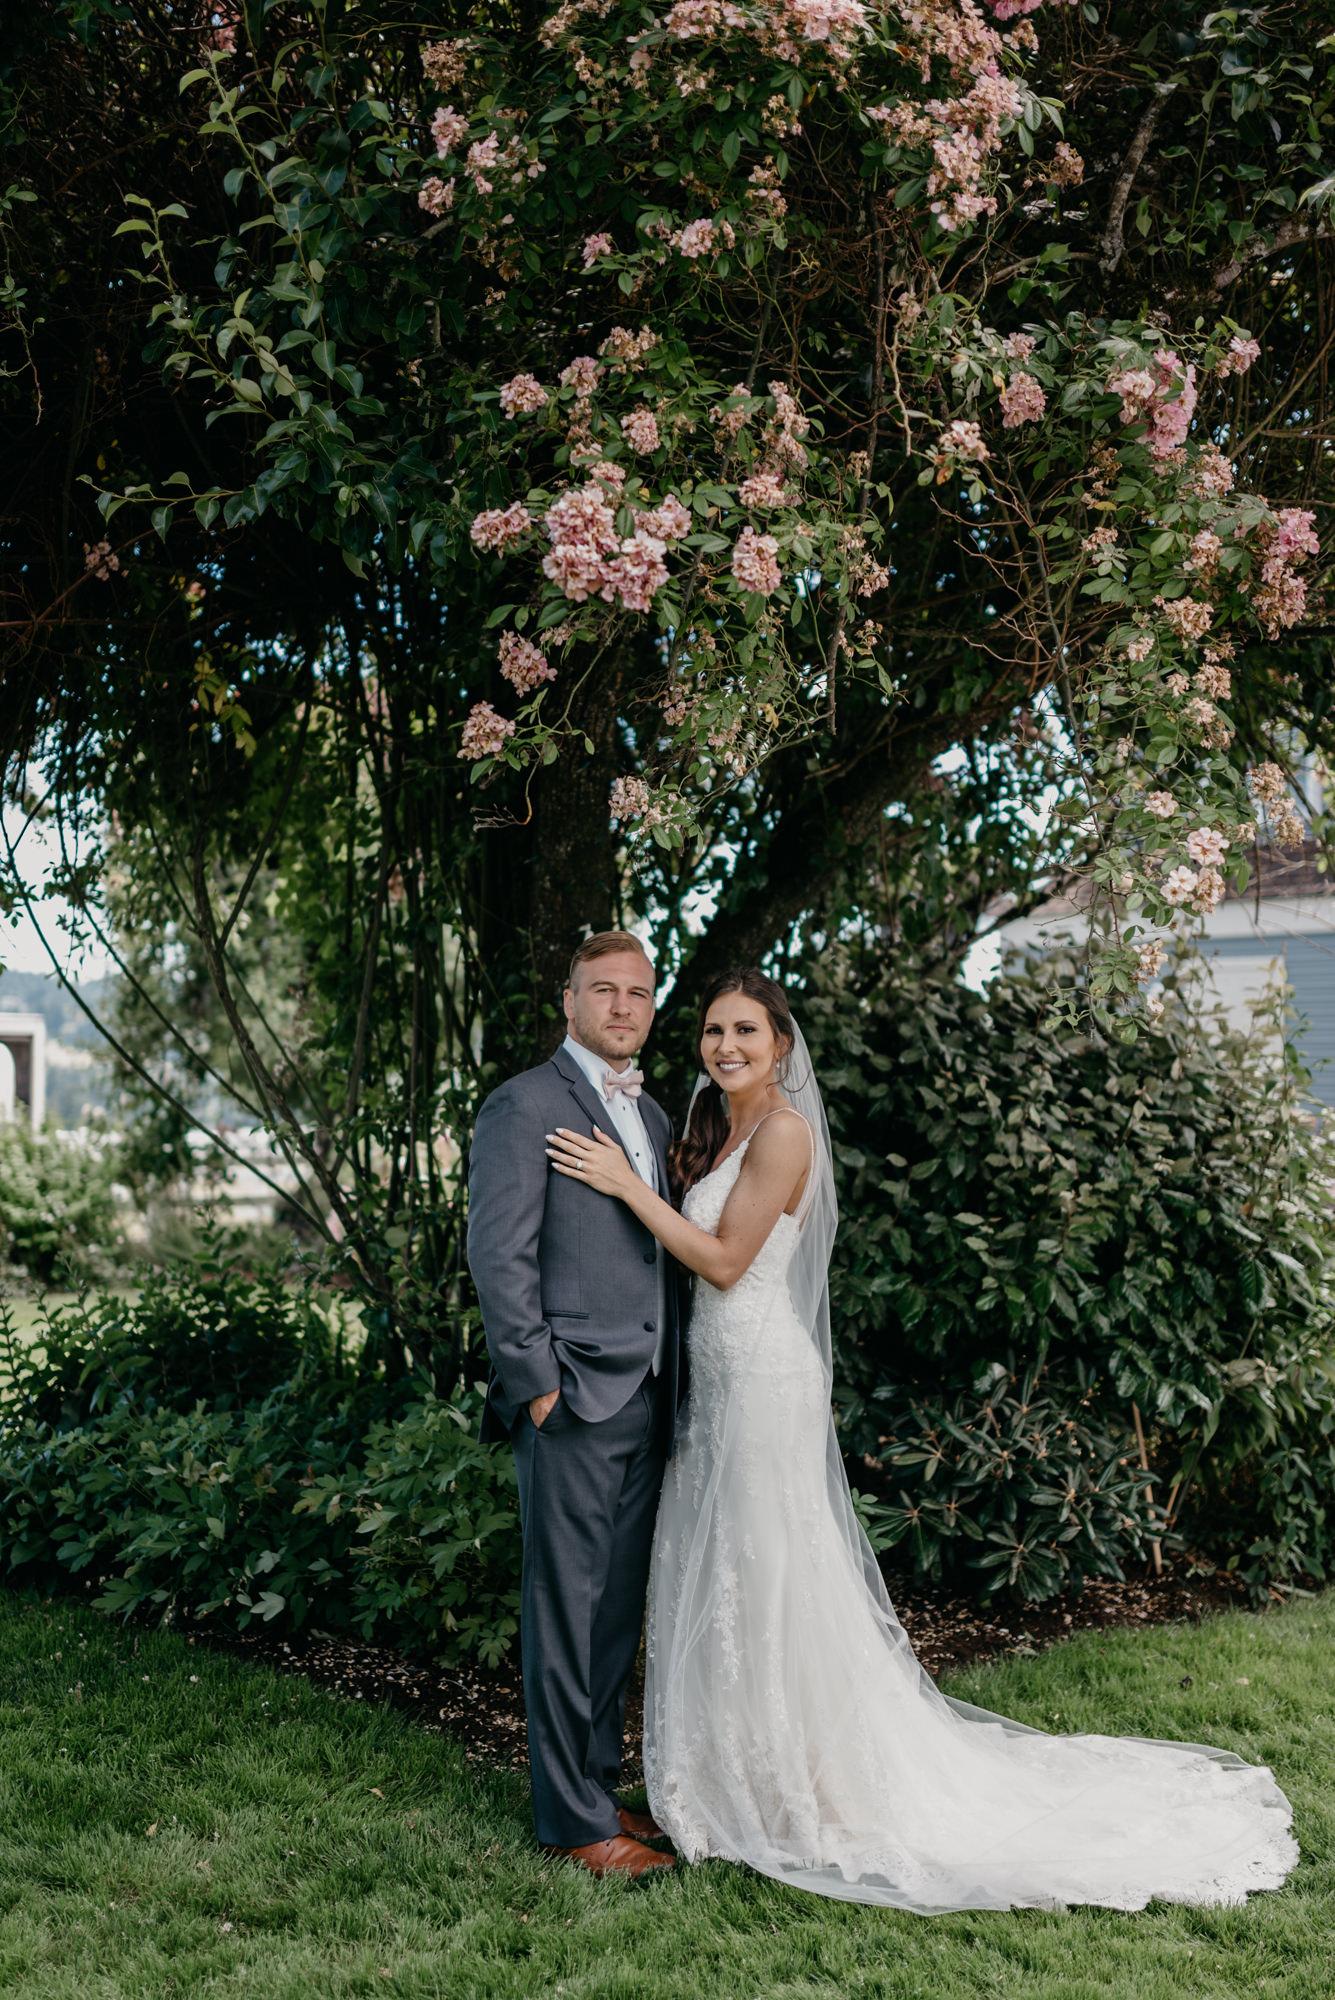 75-lake-oswego-wedding-portland-couple-rose-tree.jpg